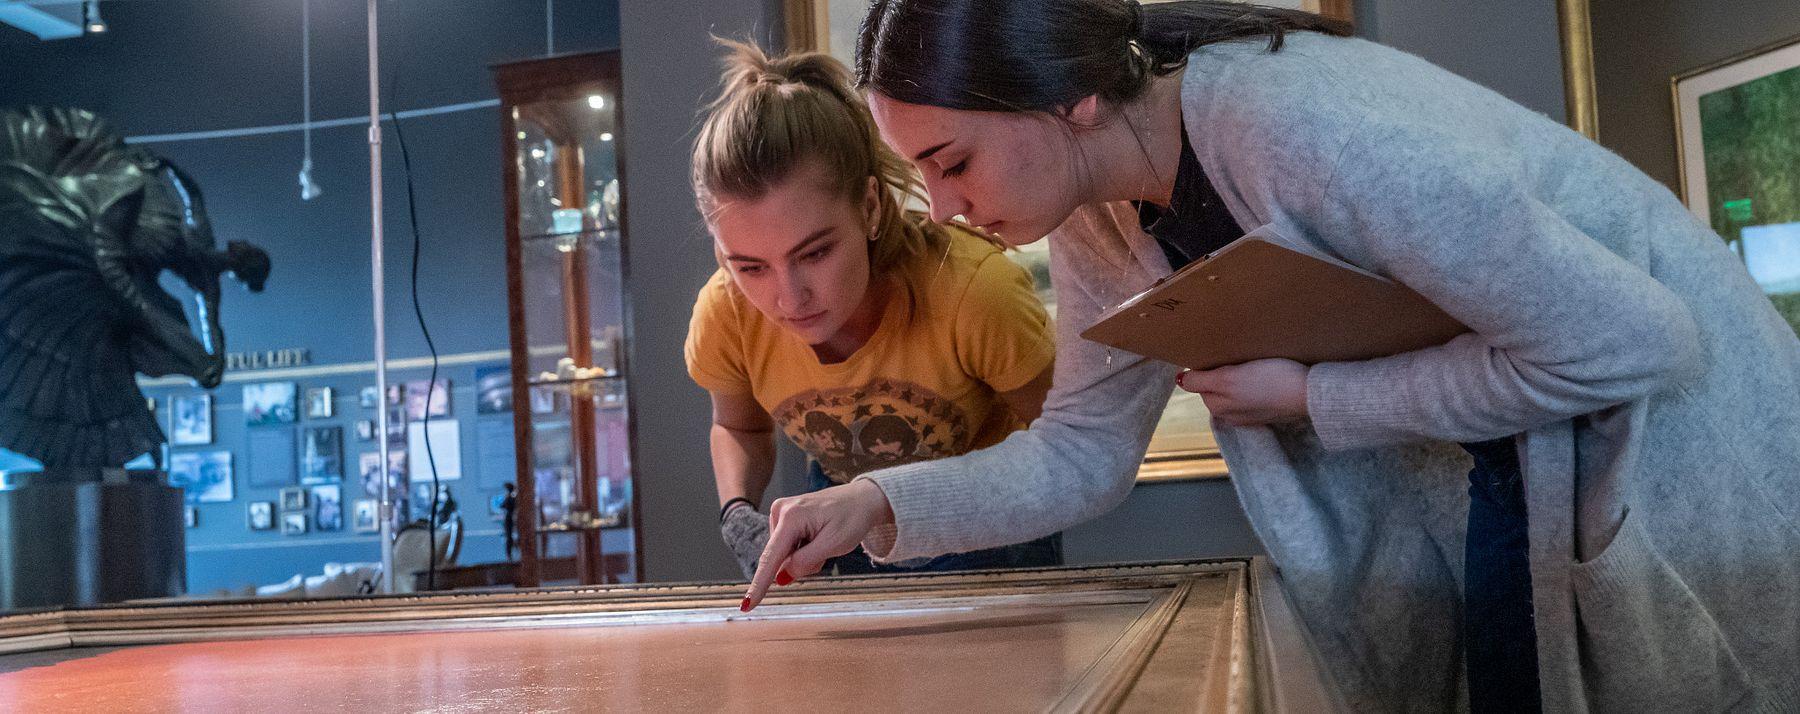 students examining painting